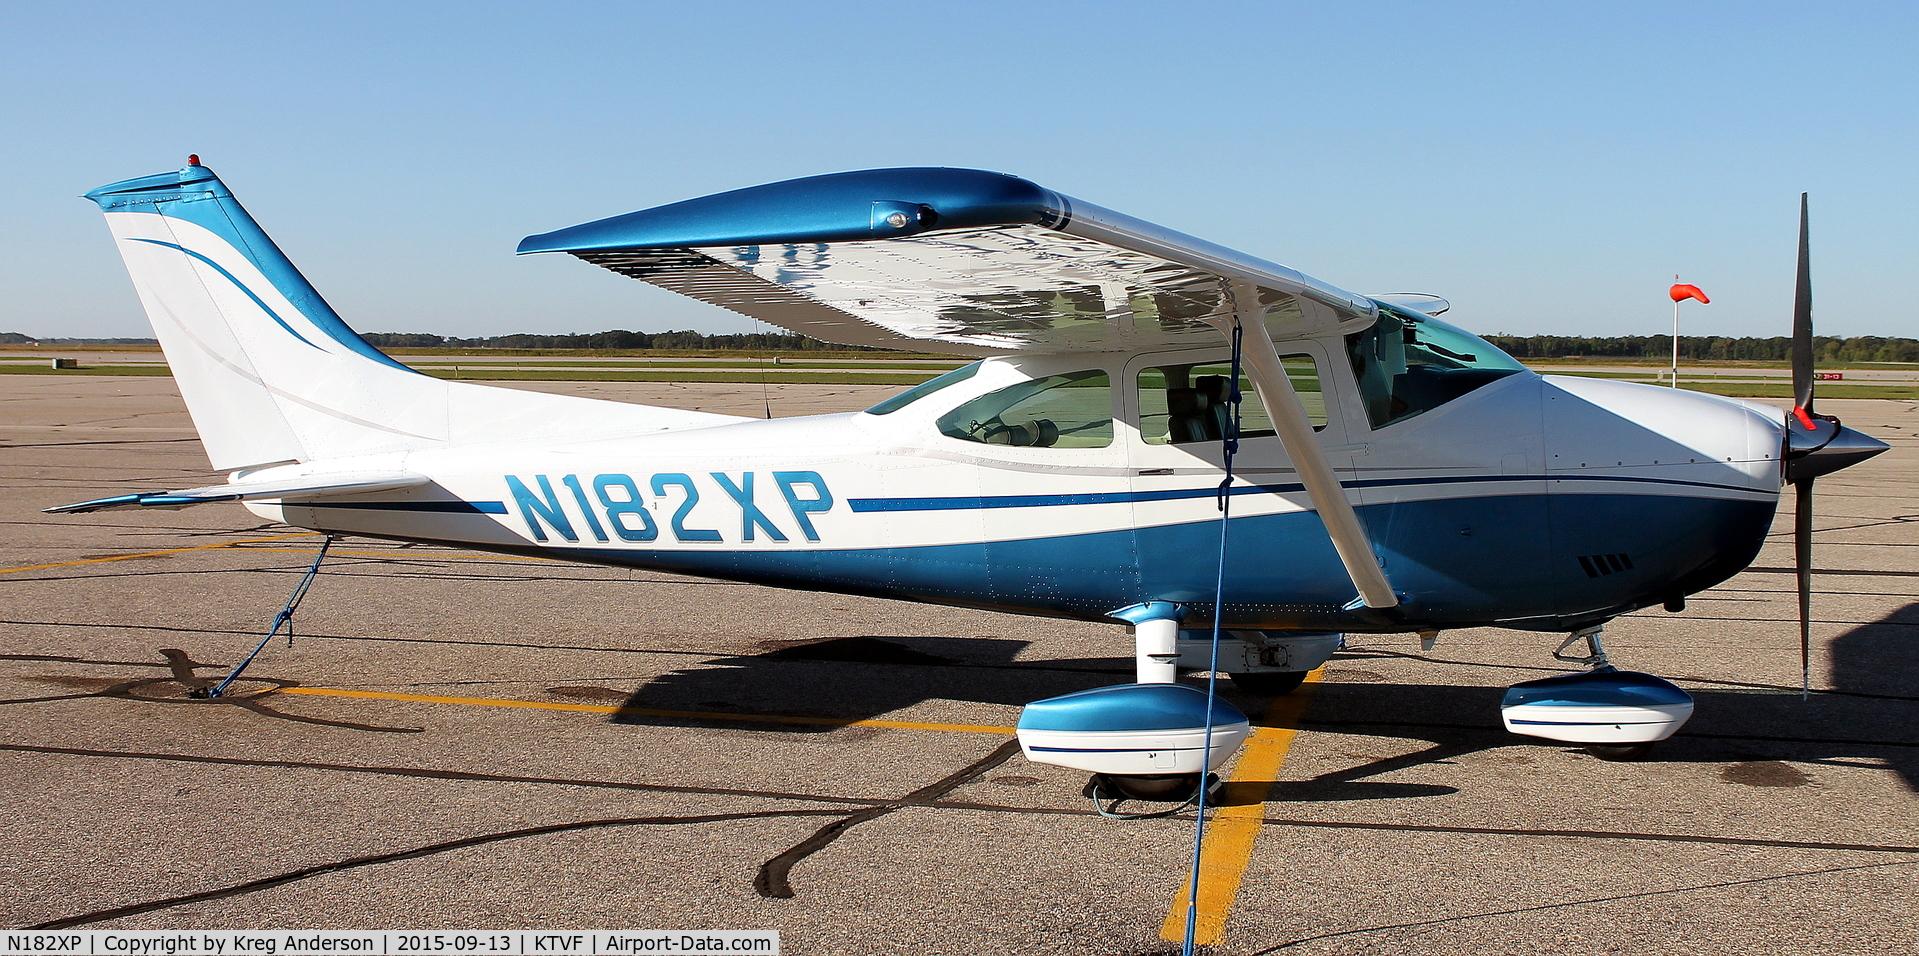 N182XP, 1973 Cessna 182P Skylane C/N 18261793, Cessna 182P Skylane on the ramp in Thief River Falls, MN.